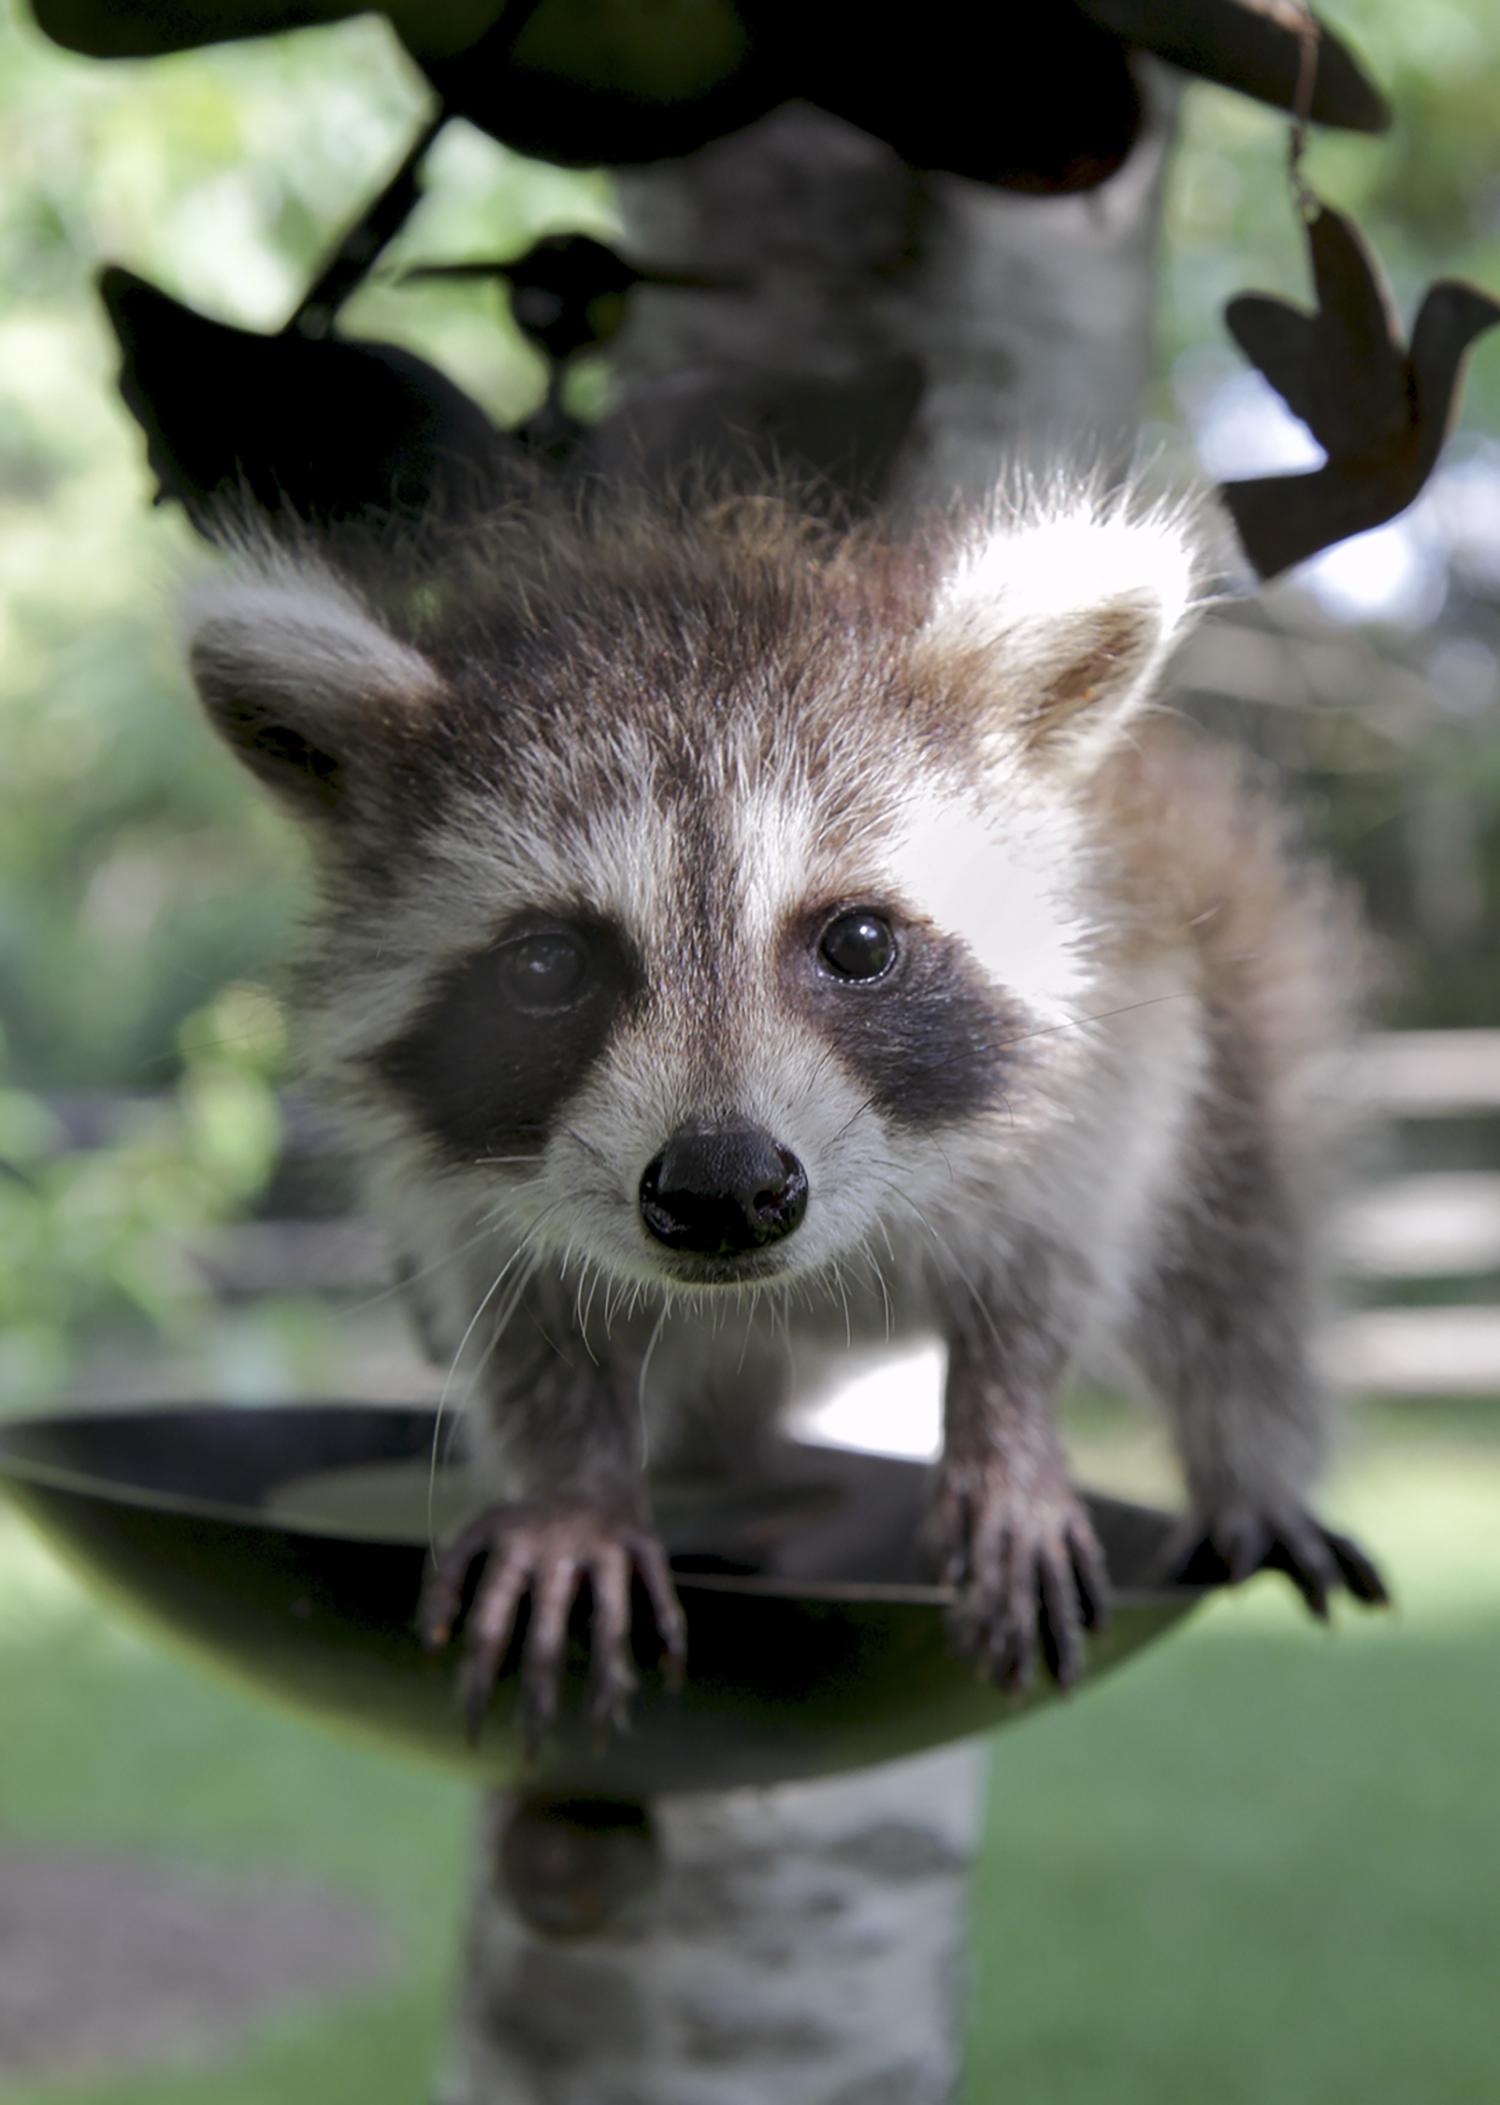 Raccoon-Baby-Wildlife-Sanctuary-Birdfeeder.jpg